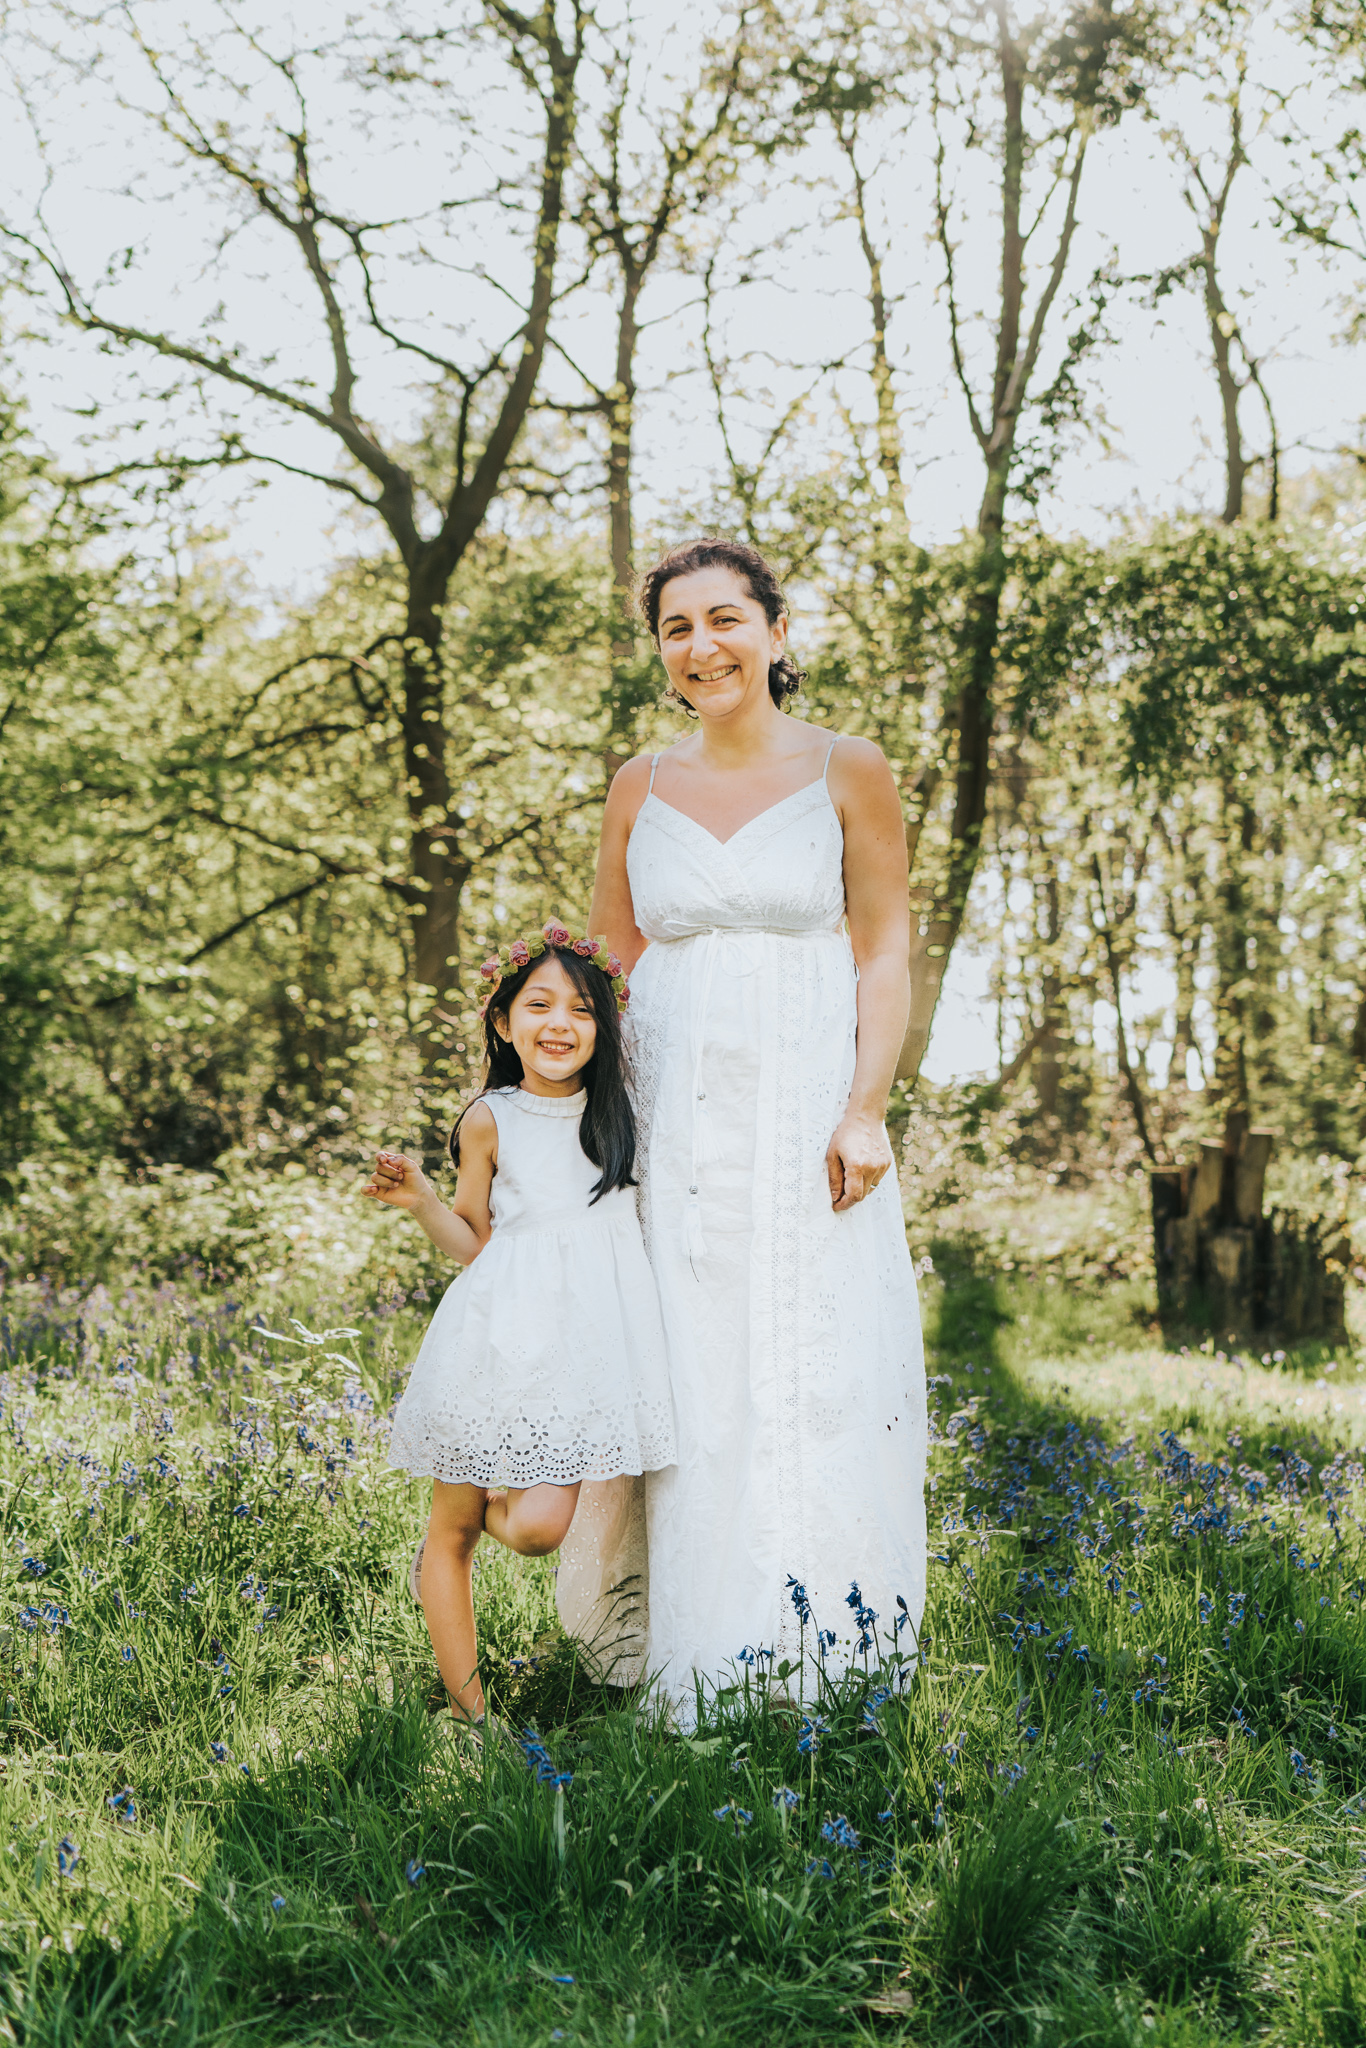 Chandrasiri-Family-Session-Woodland-Colchester-Essex-Grace-Elizabeth-Alternative-Wedding-Photographer (1 of 1).jpg (29 of 34).jpg